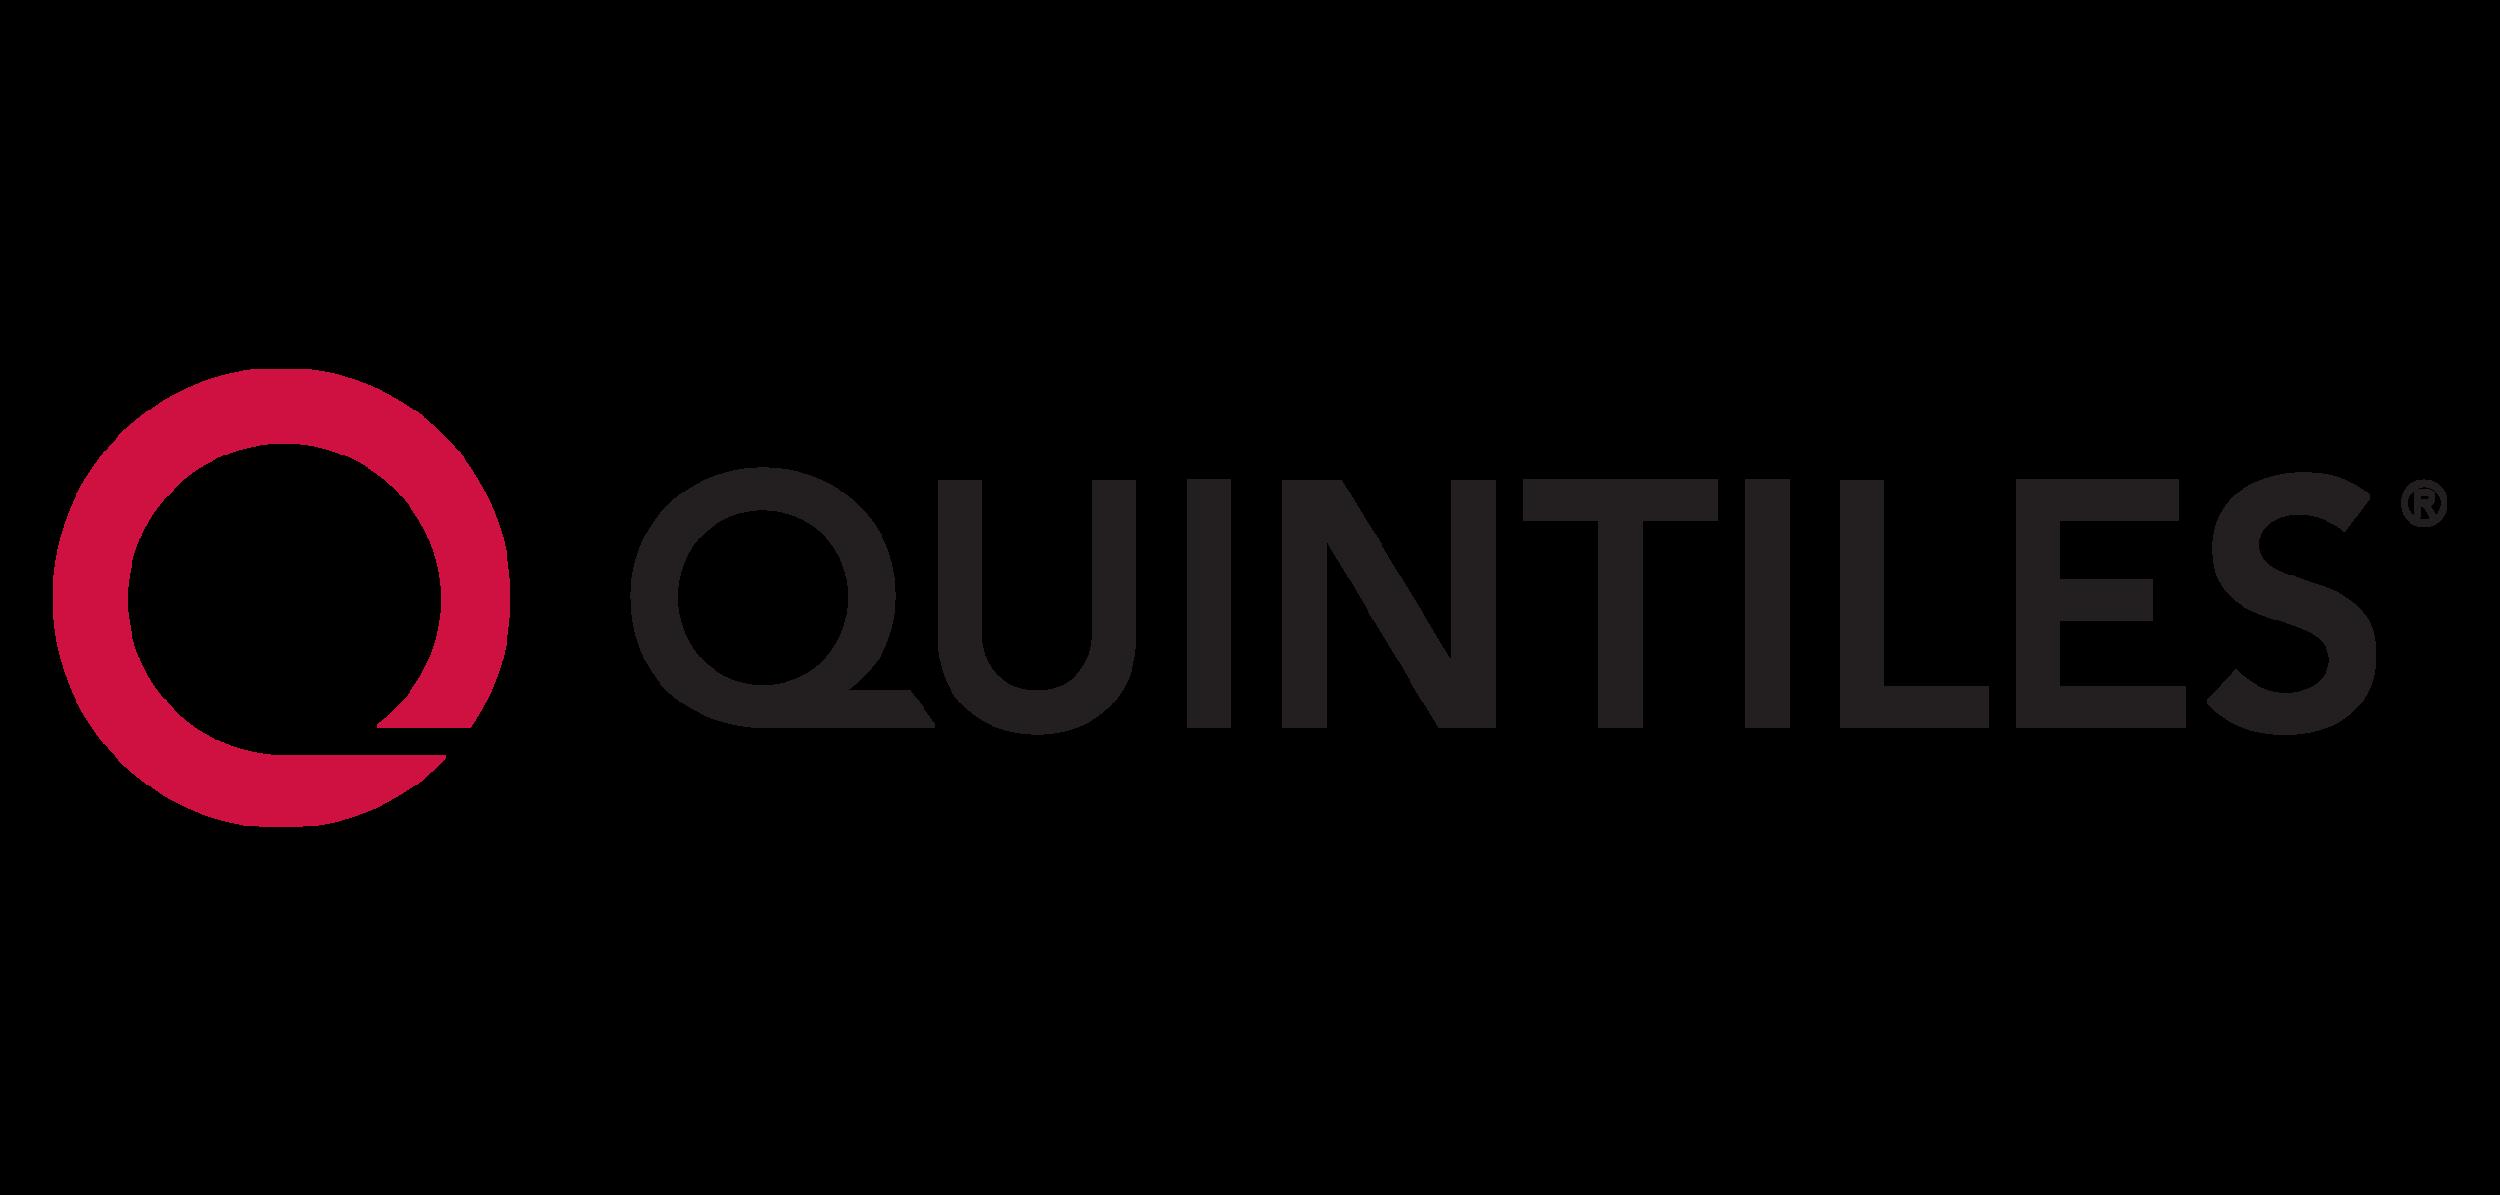 Quintiles.png